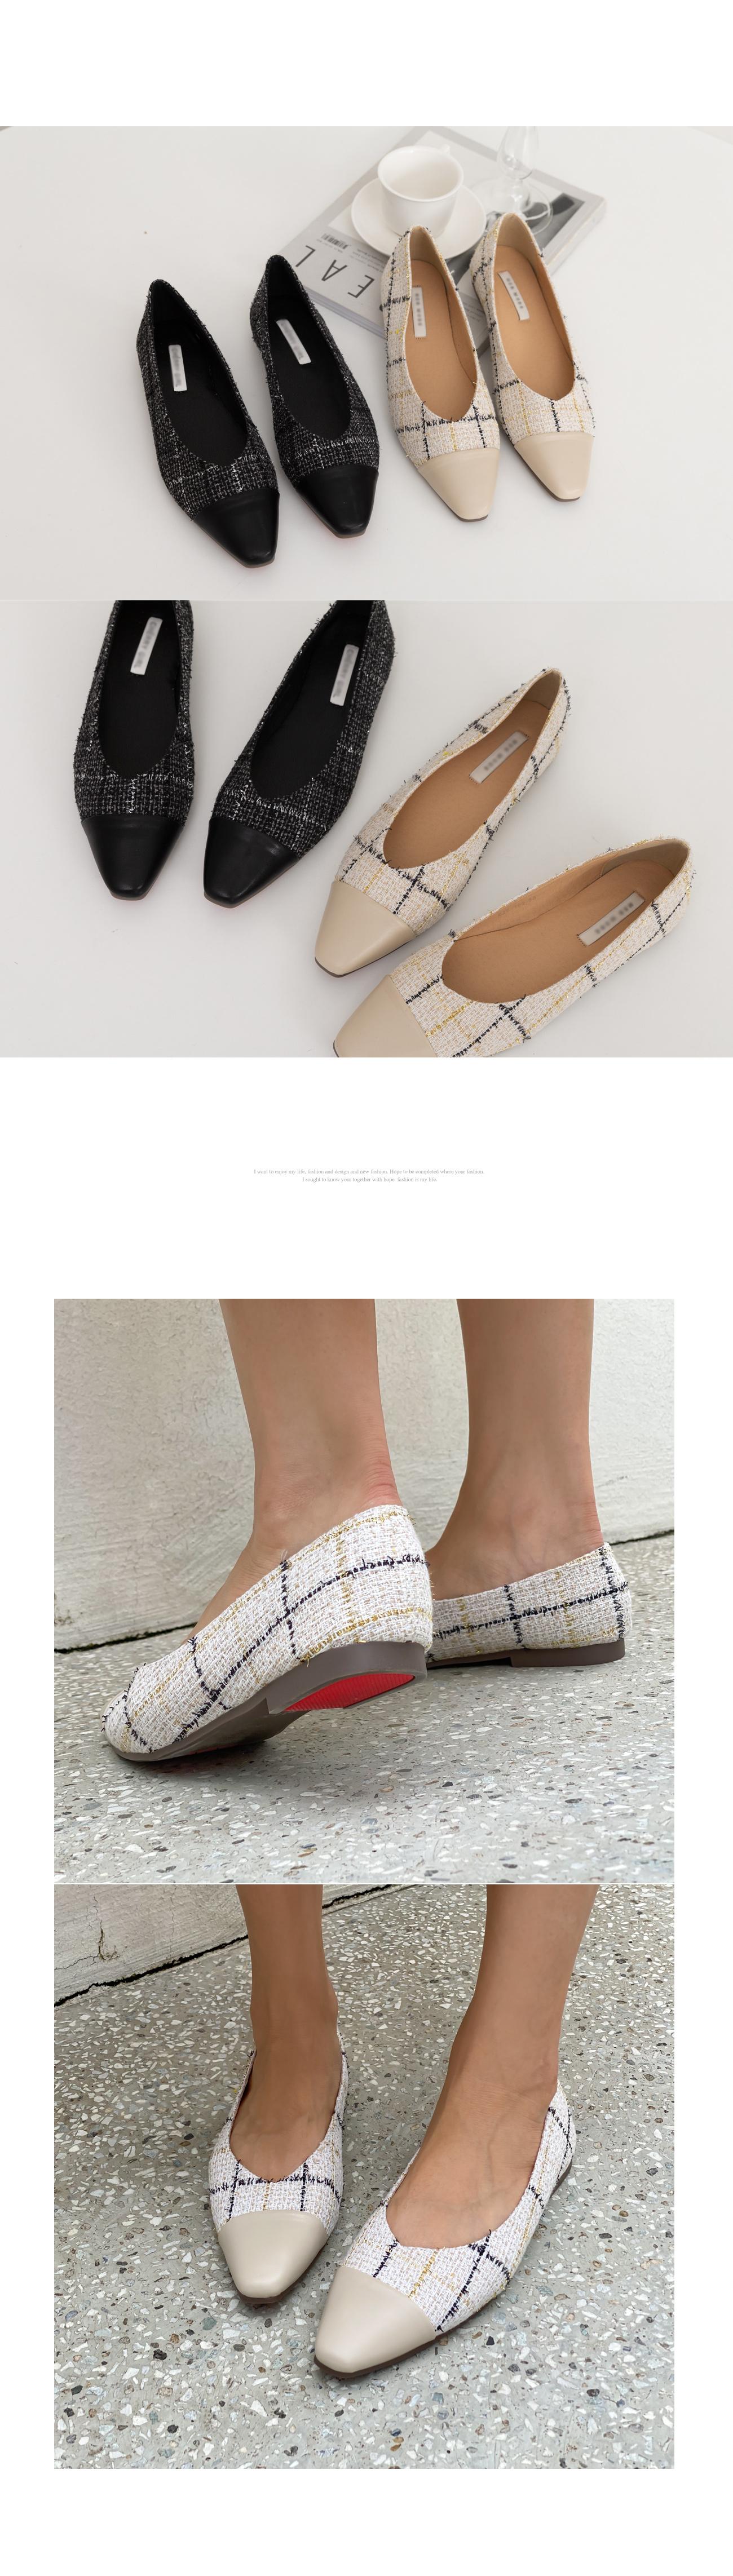 Tweed Flat Shoes #86277